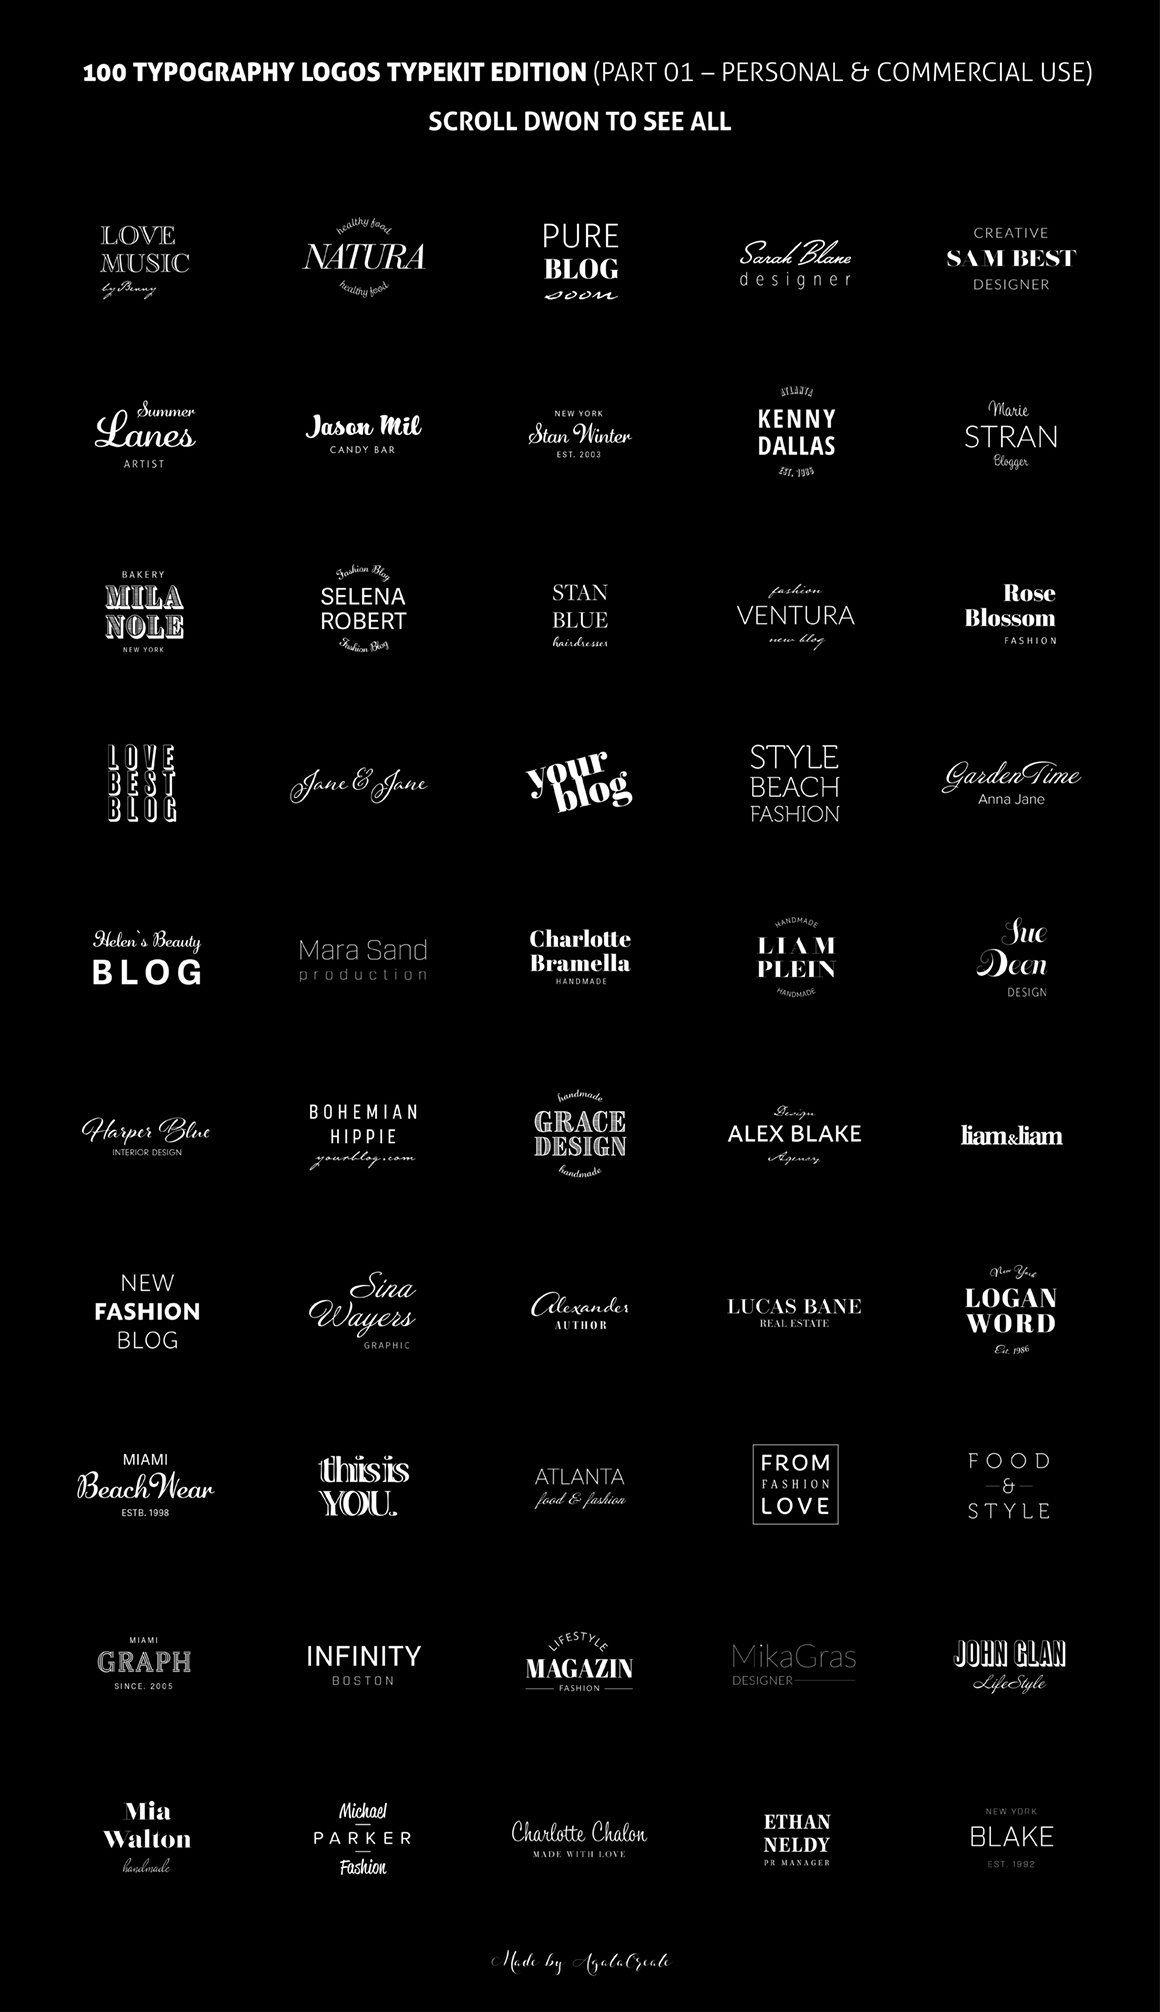 100 Typography Logos Typekit Edition in 2020 Typography